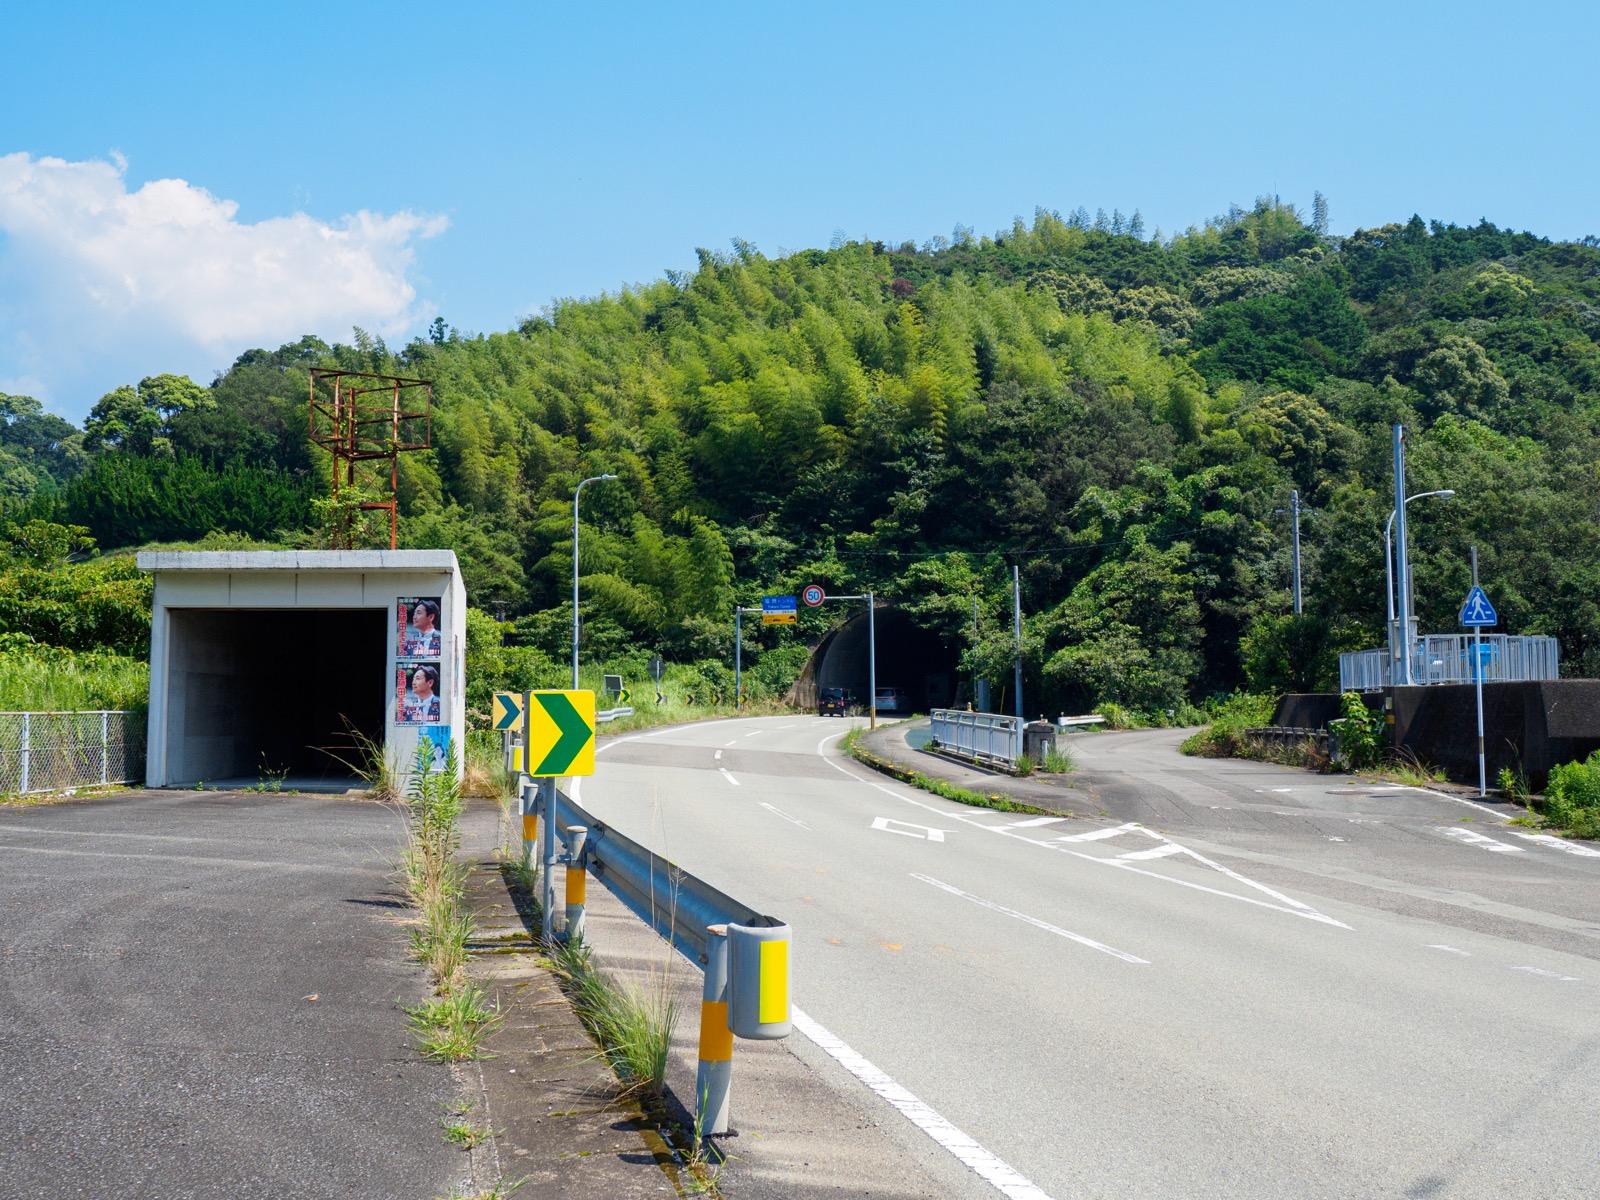 鯖瀬駅前を通る国道55号線